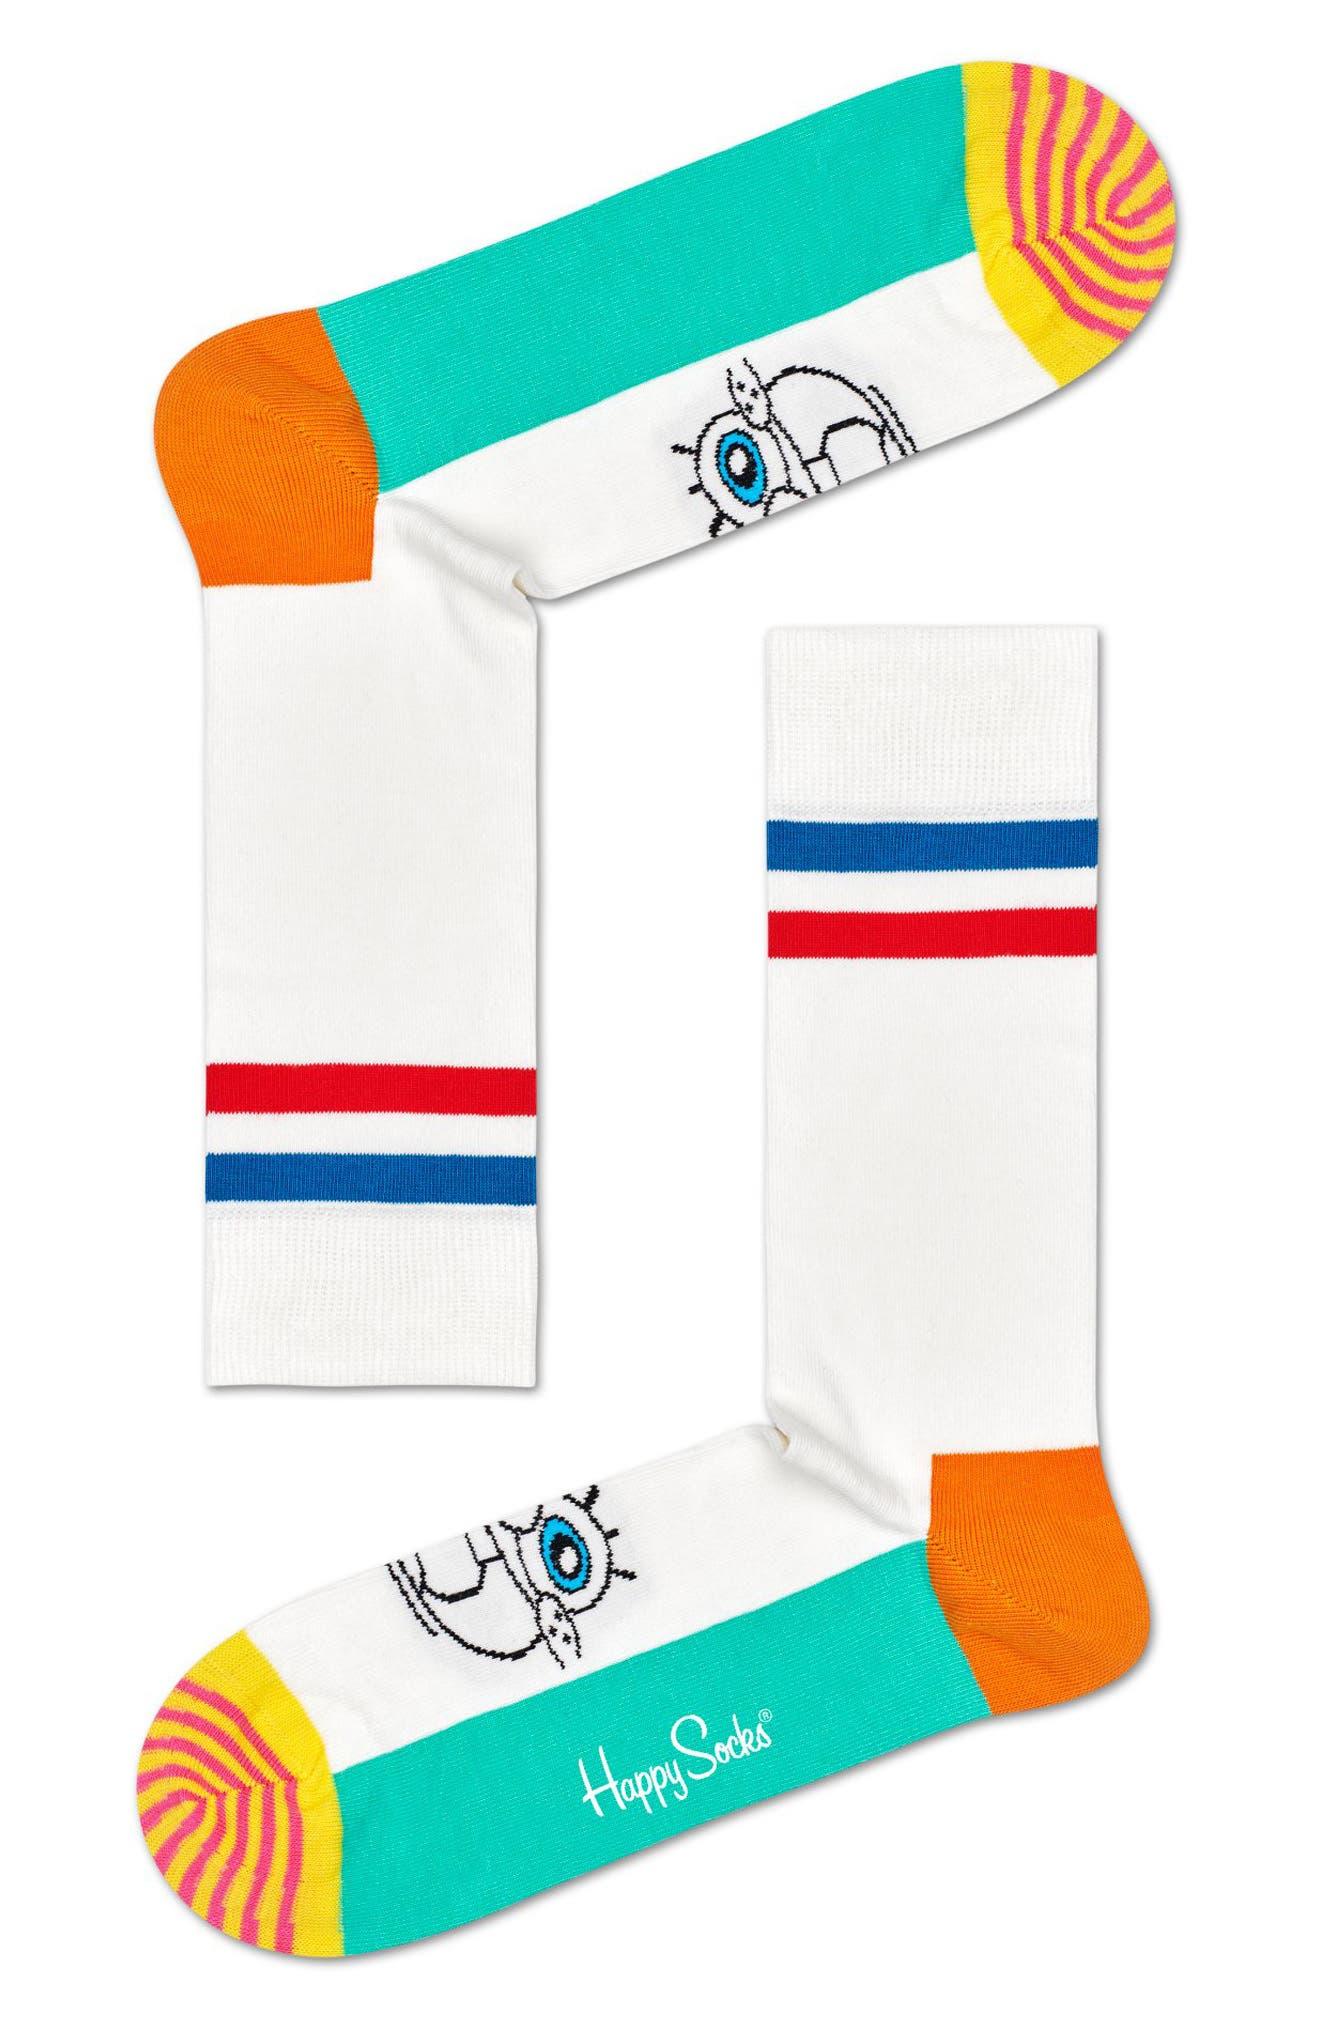 Spongebob Original Socks